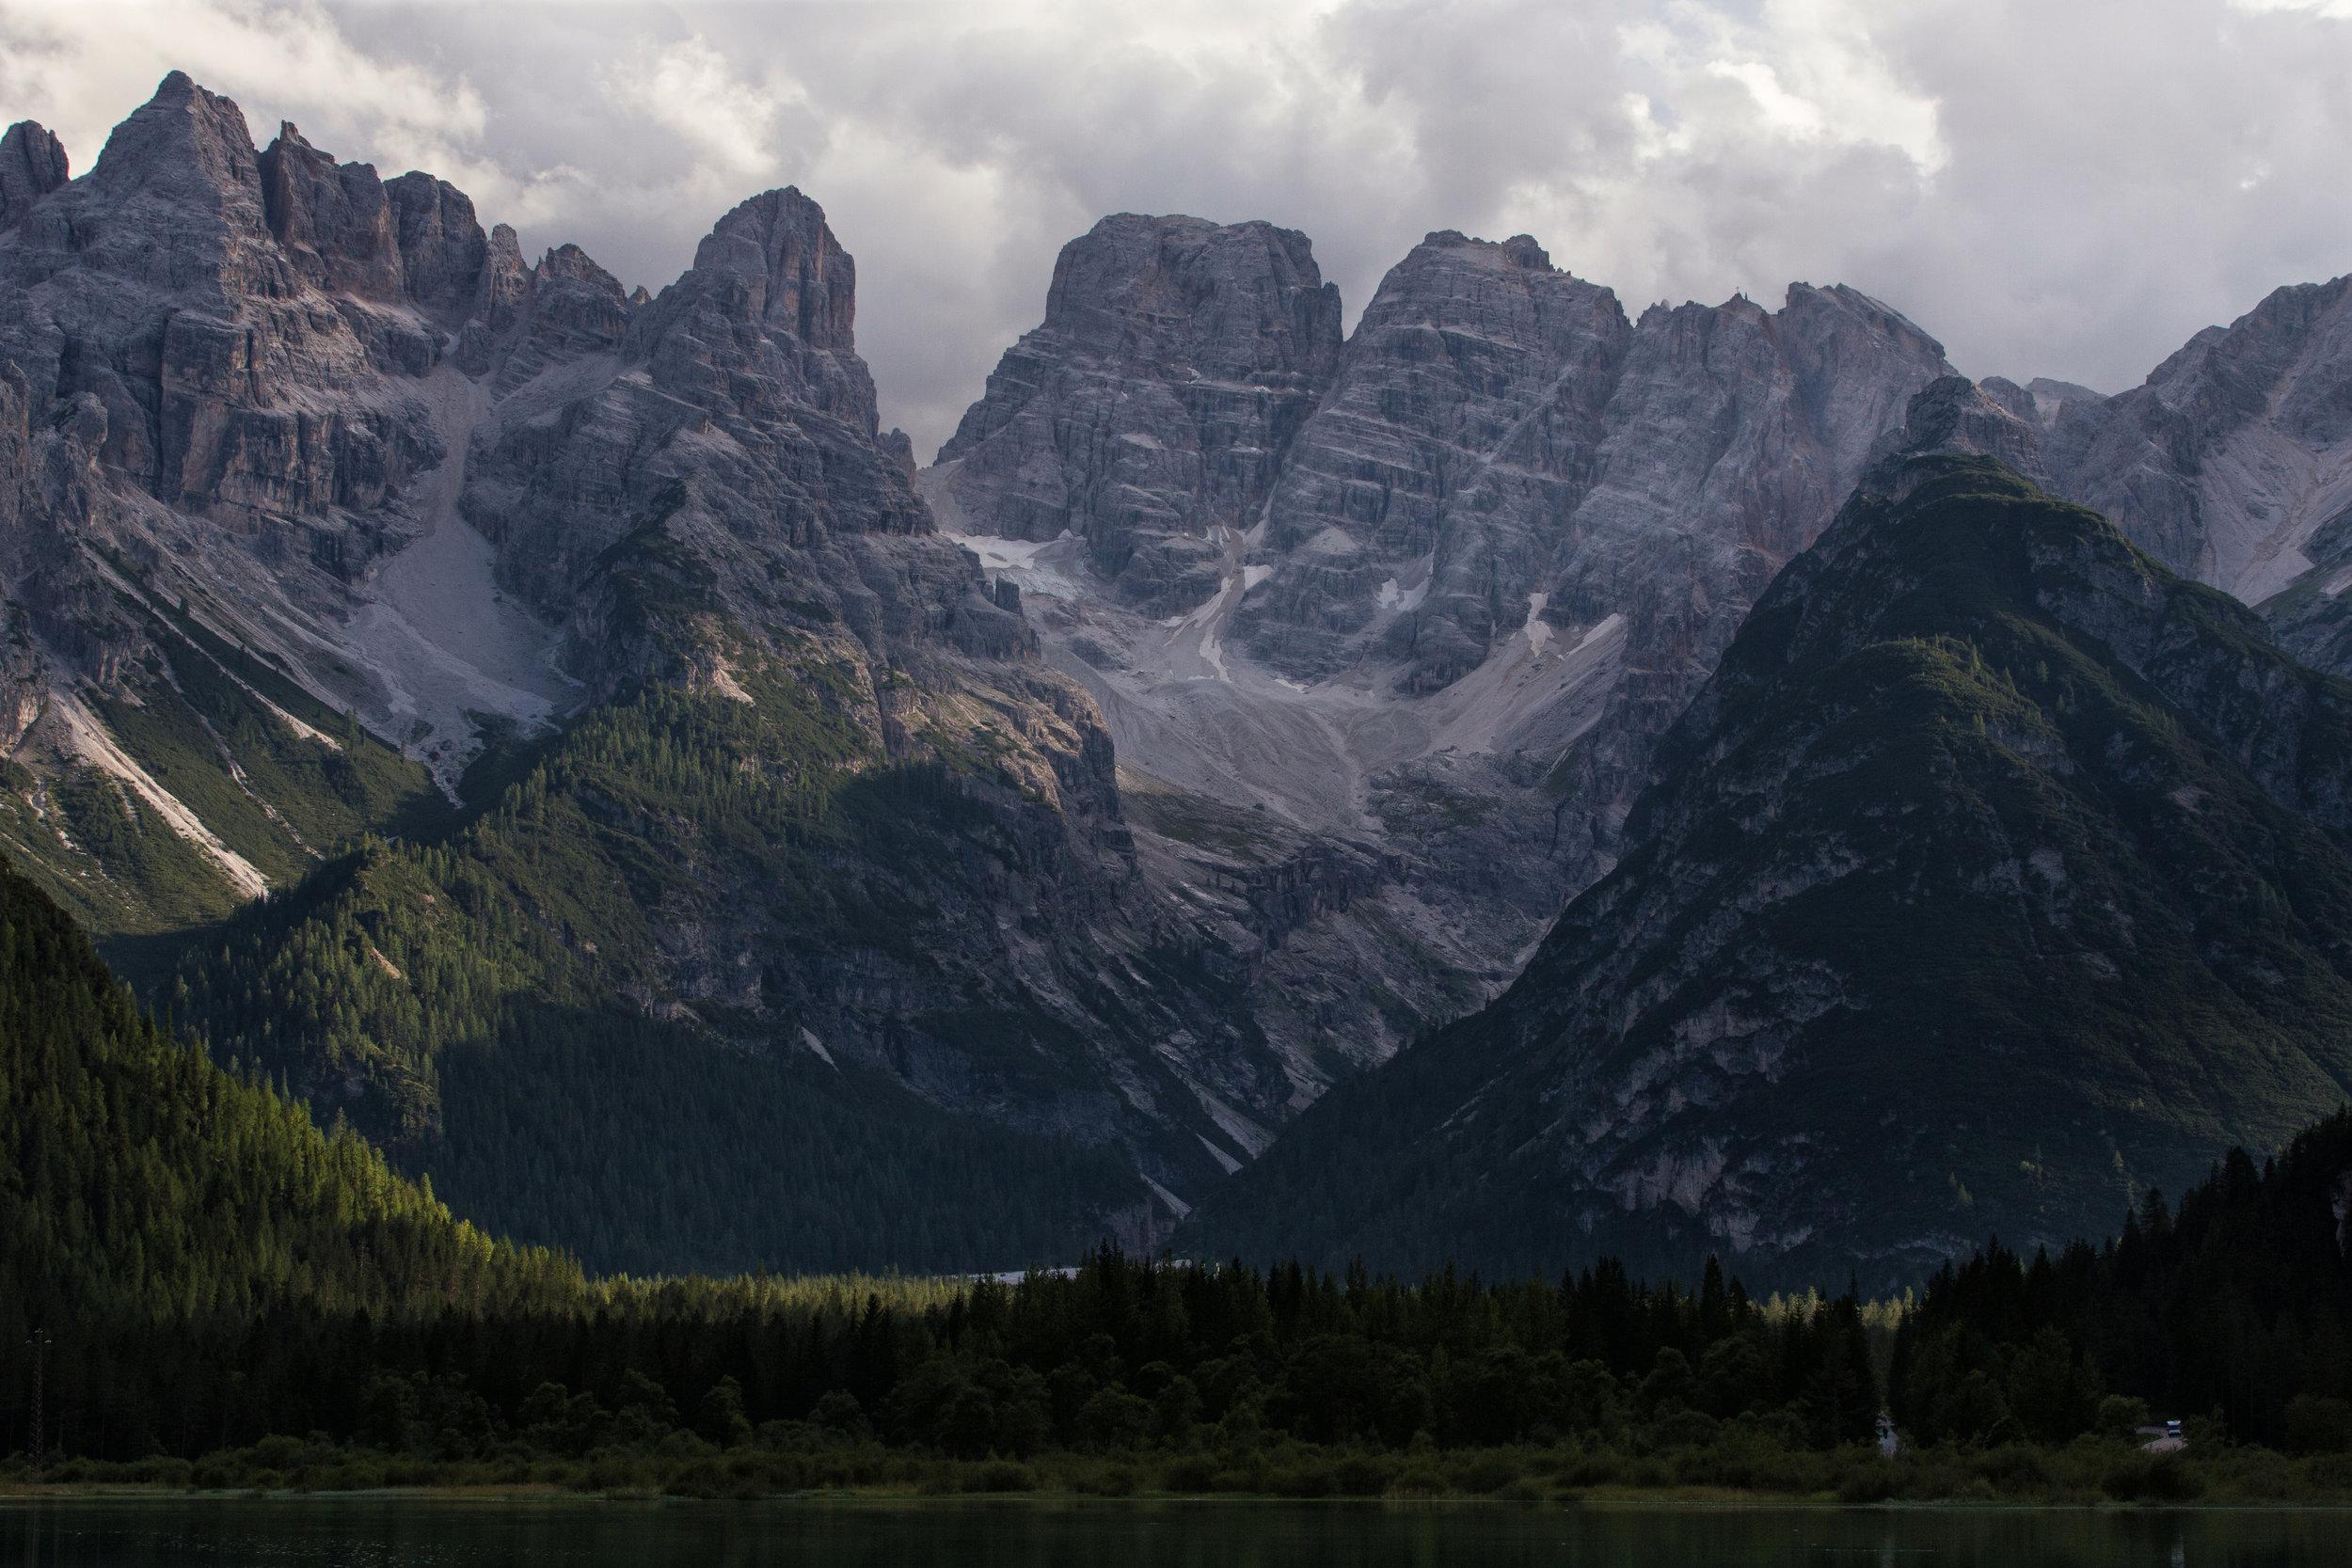 Monte Cristallo (click to enlarge)